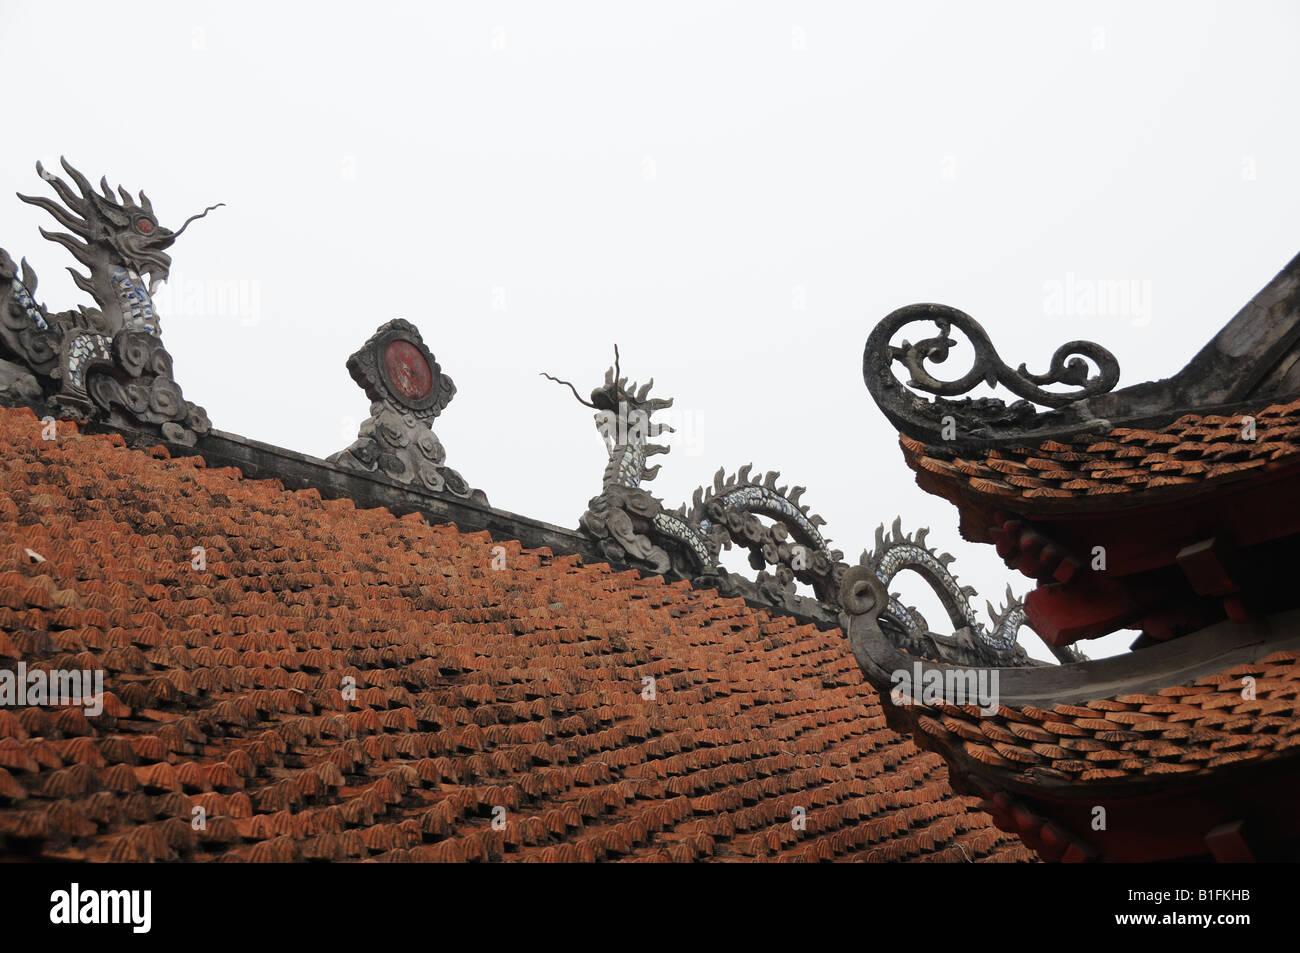 Roof detail showing dragons One pillar Pagoda Hanoi Vietnam Stock Photo